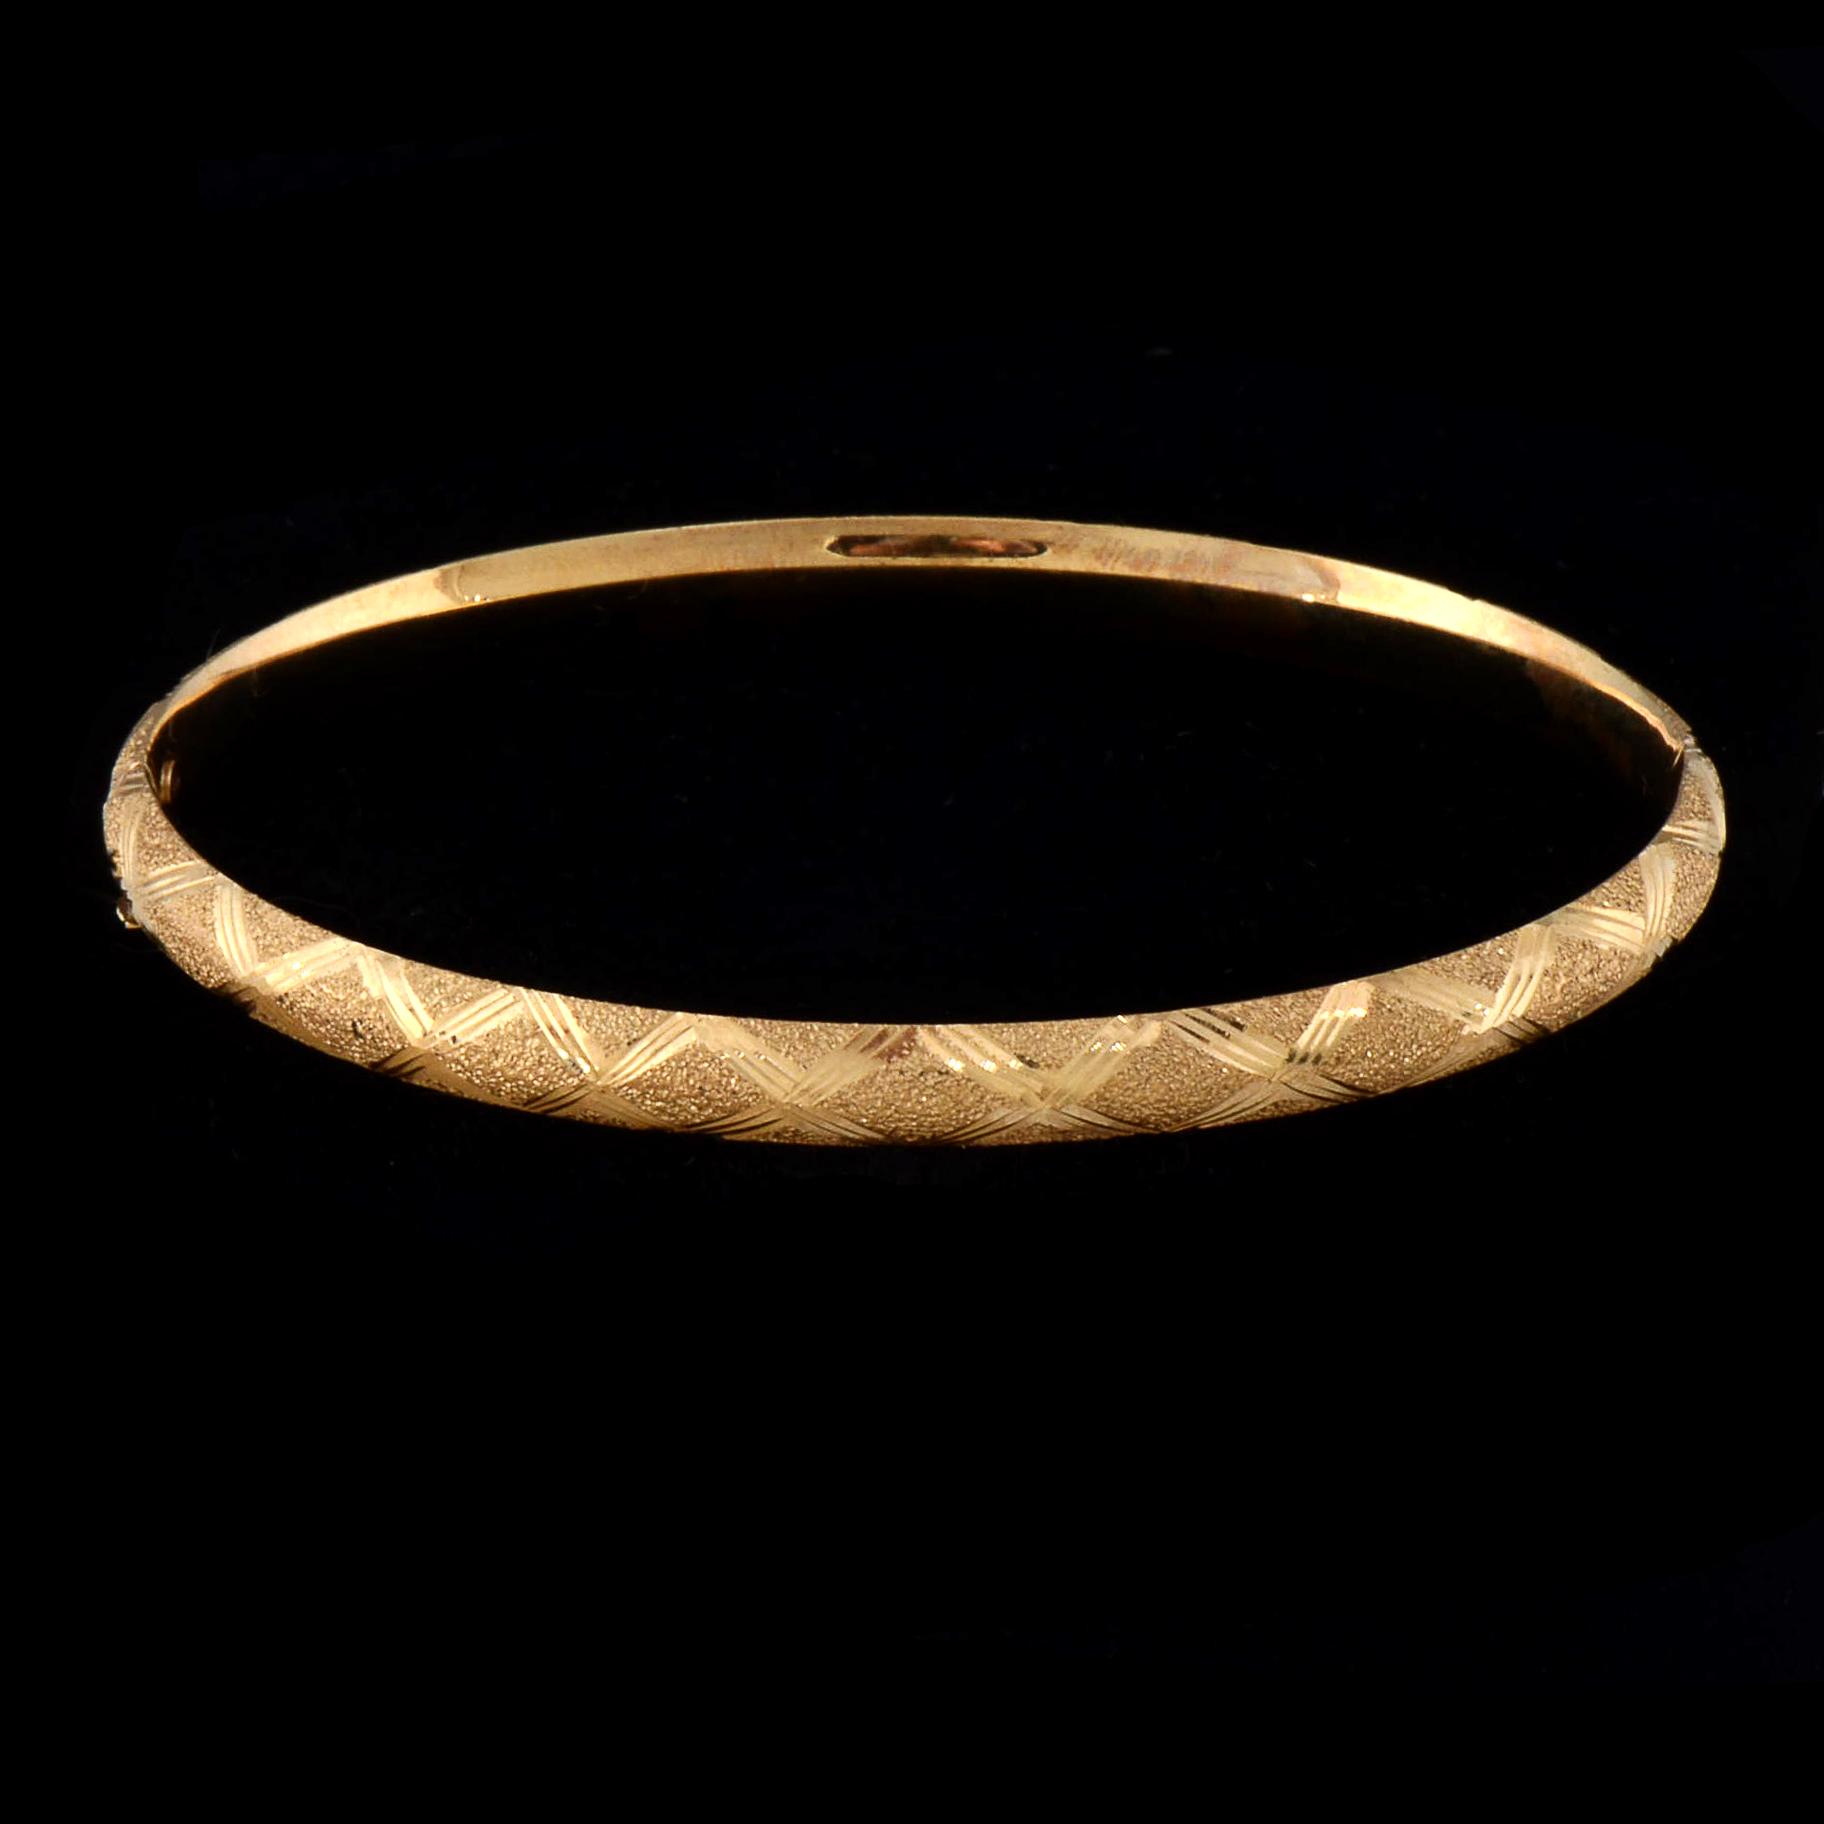 Avon 14K Yellow Gold Engraved Bangle EBTH